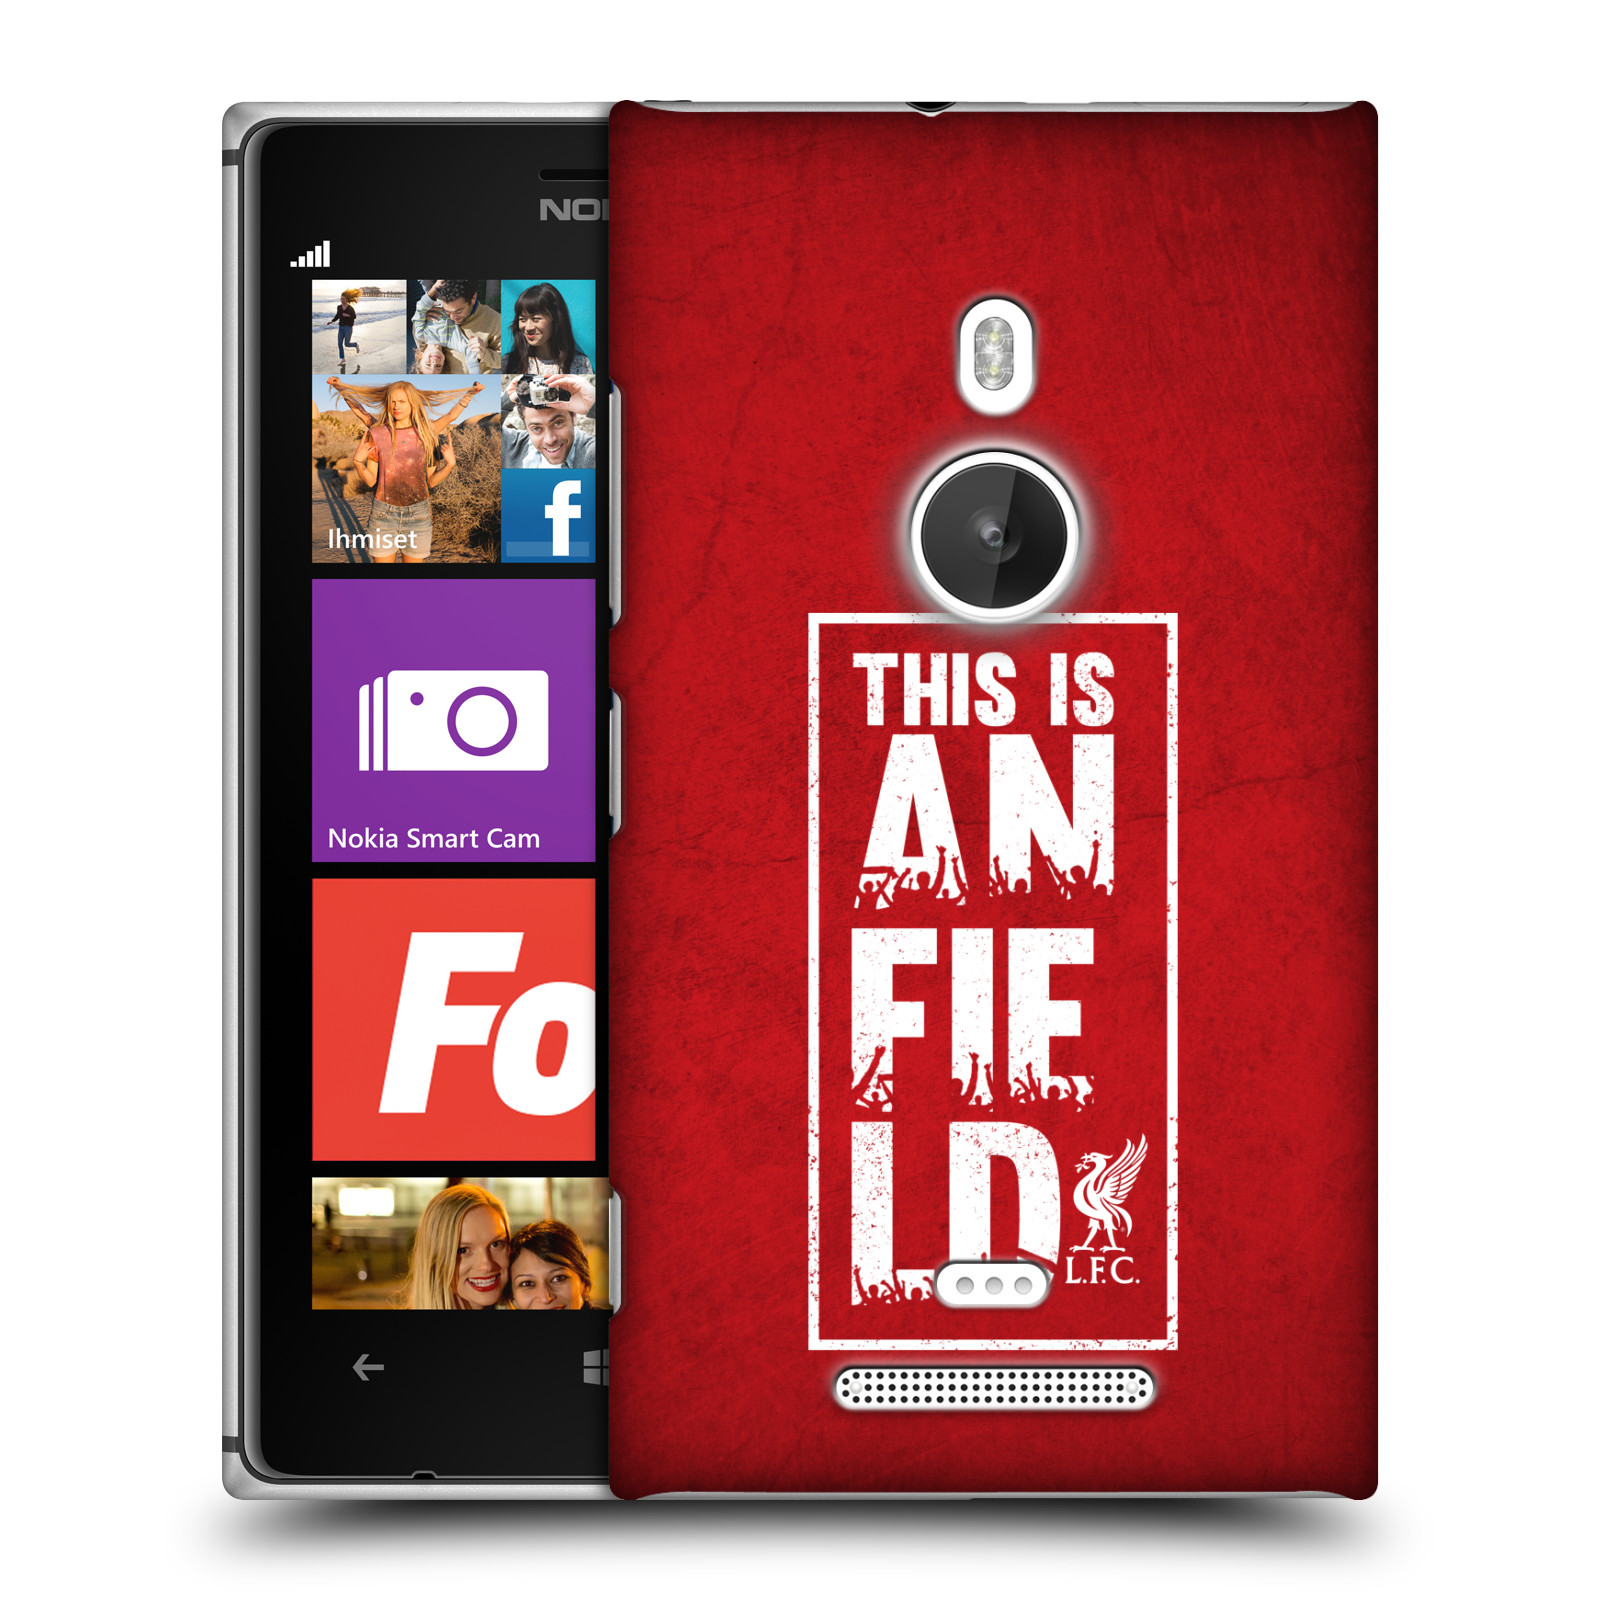 Plastové pouzdro na mobil Nokia Lumia 925 HEAD CASE Liverpool FC This Is Anfield Red (Kryt či obal na mobilní telefon Liverpool FC Official pro Nokia Lumia 925)